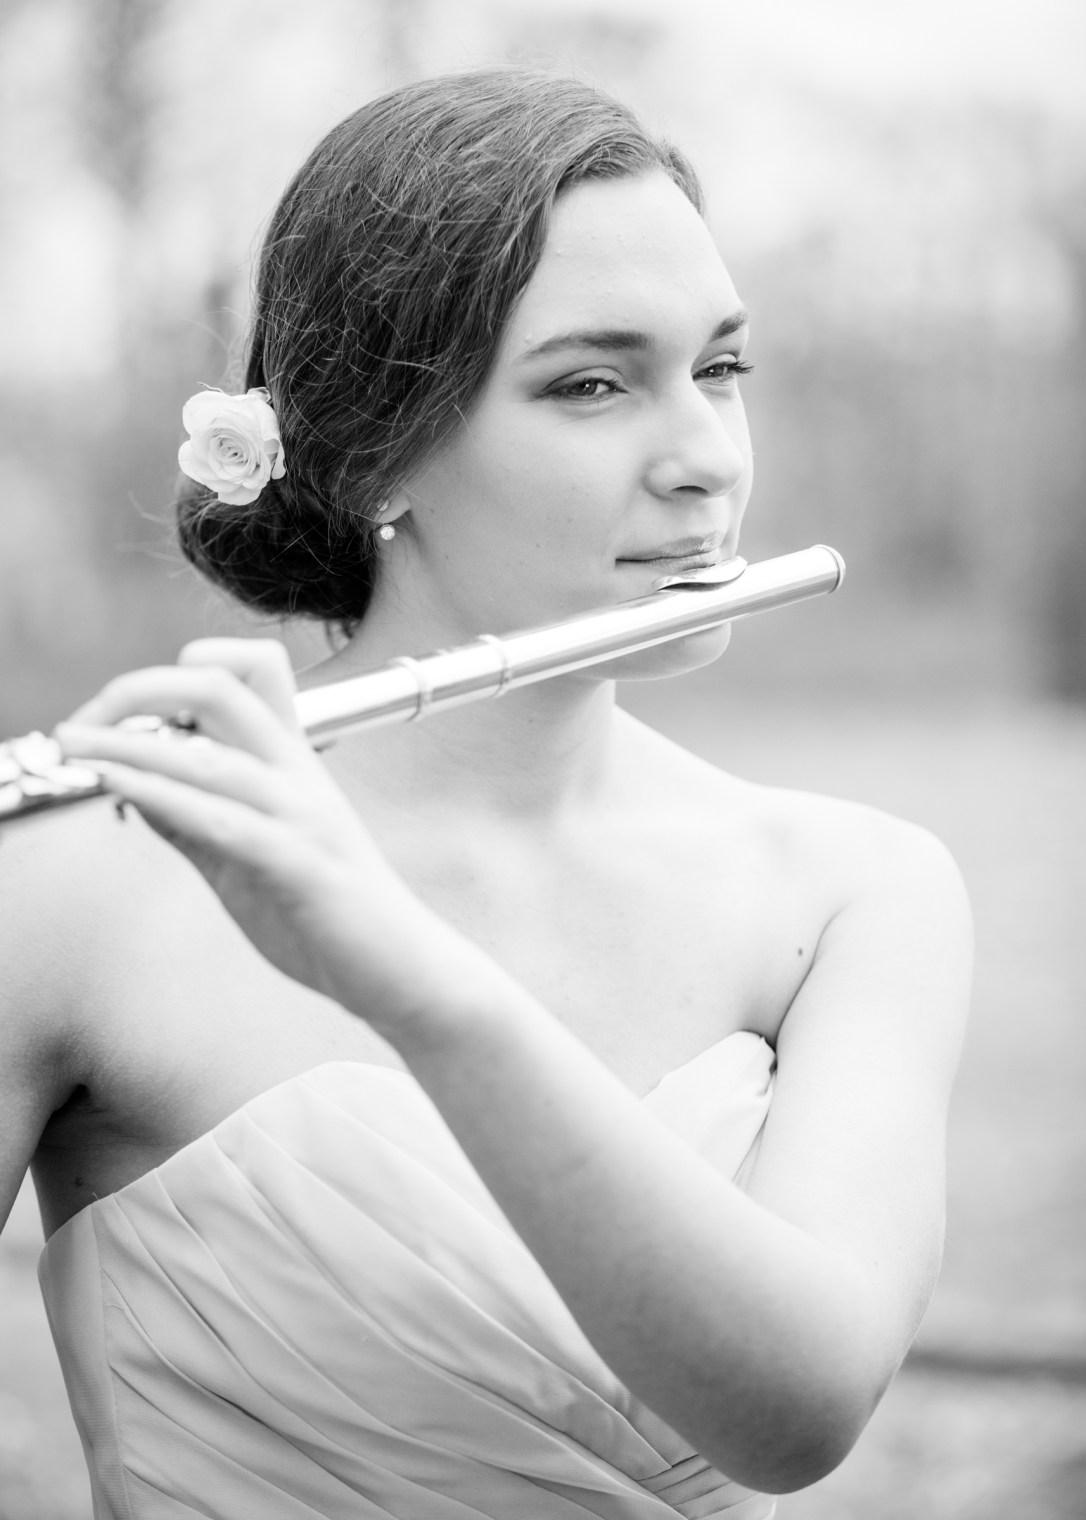 Karina wedding harpist playing the flute